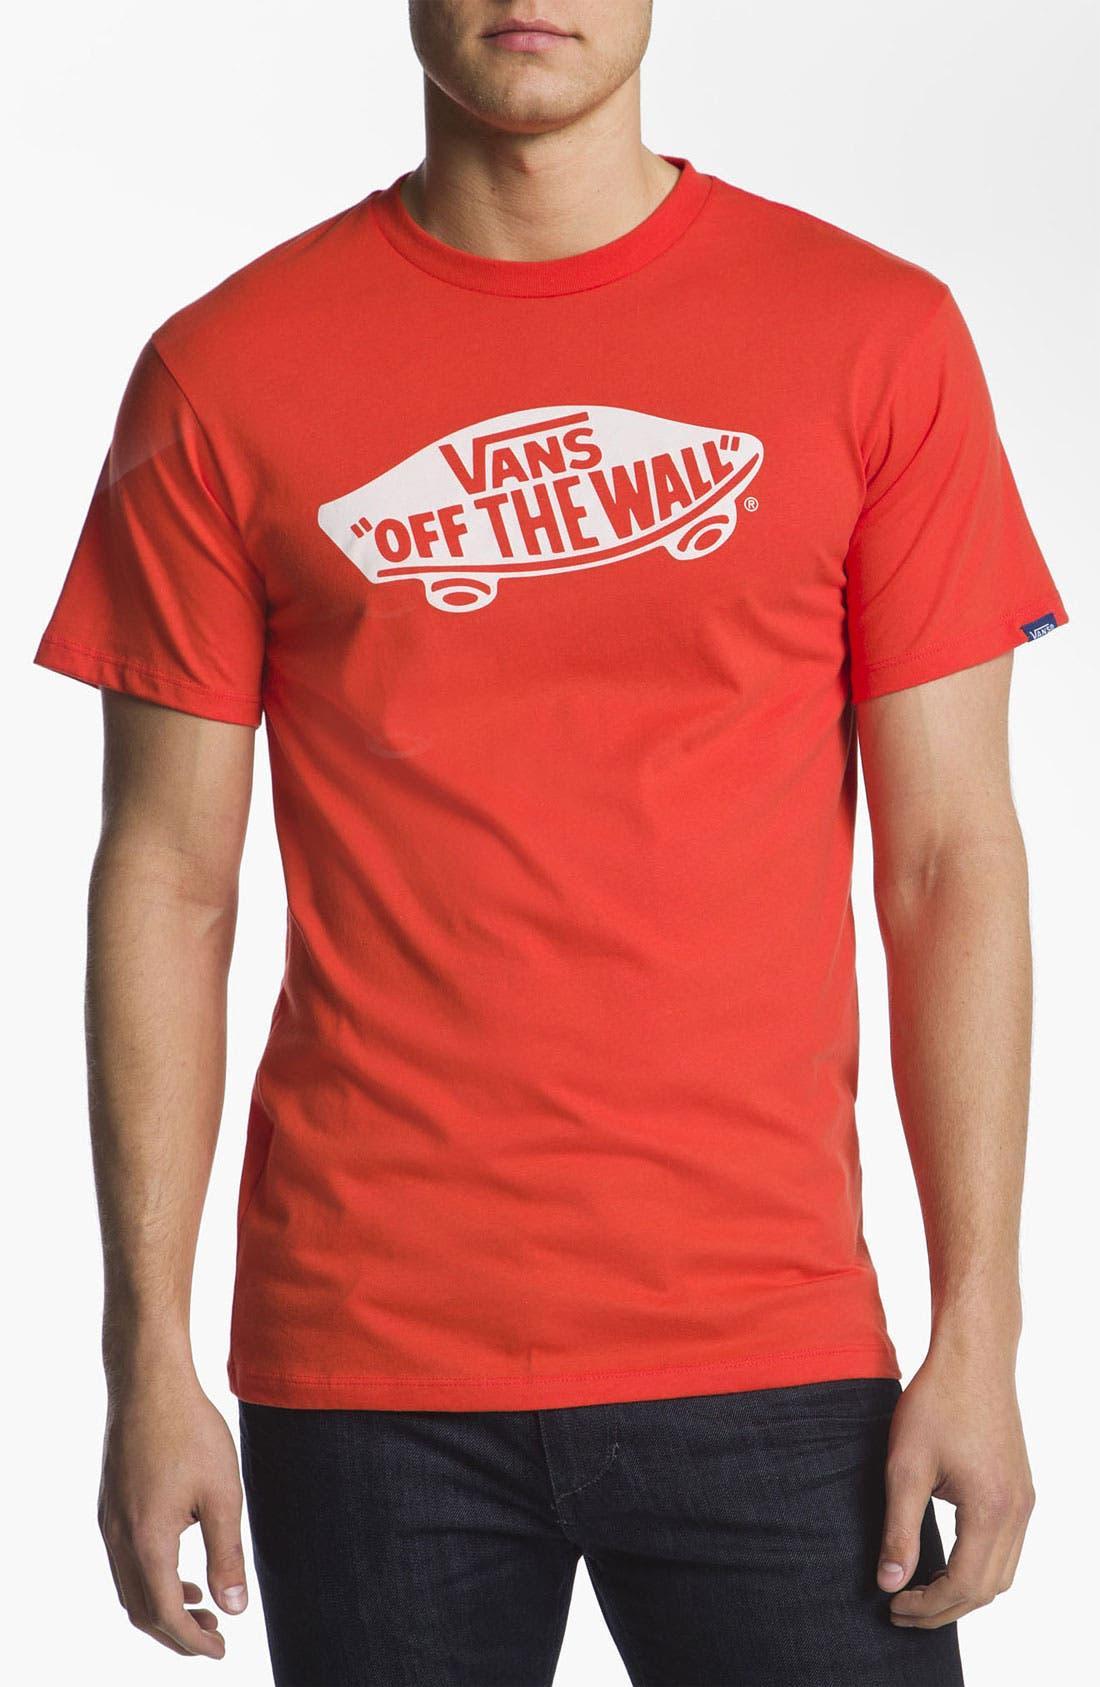 Alternate Image 1 Selected - Vans 'OTW' T-Shirt